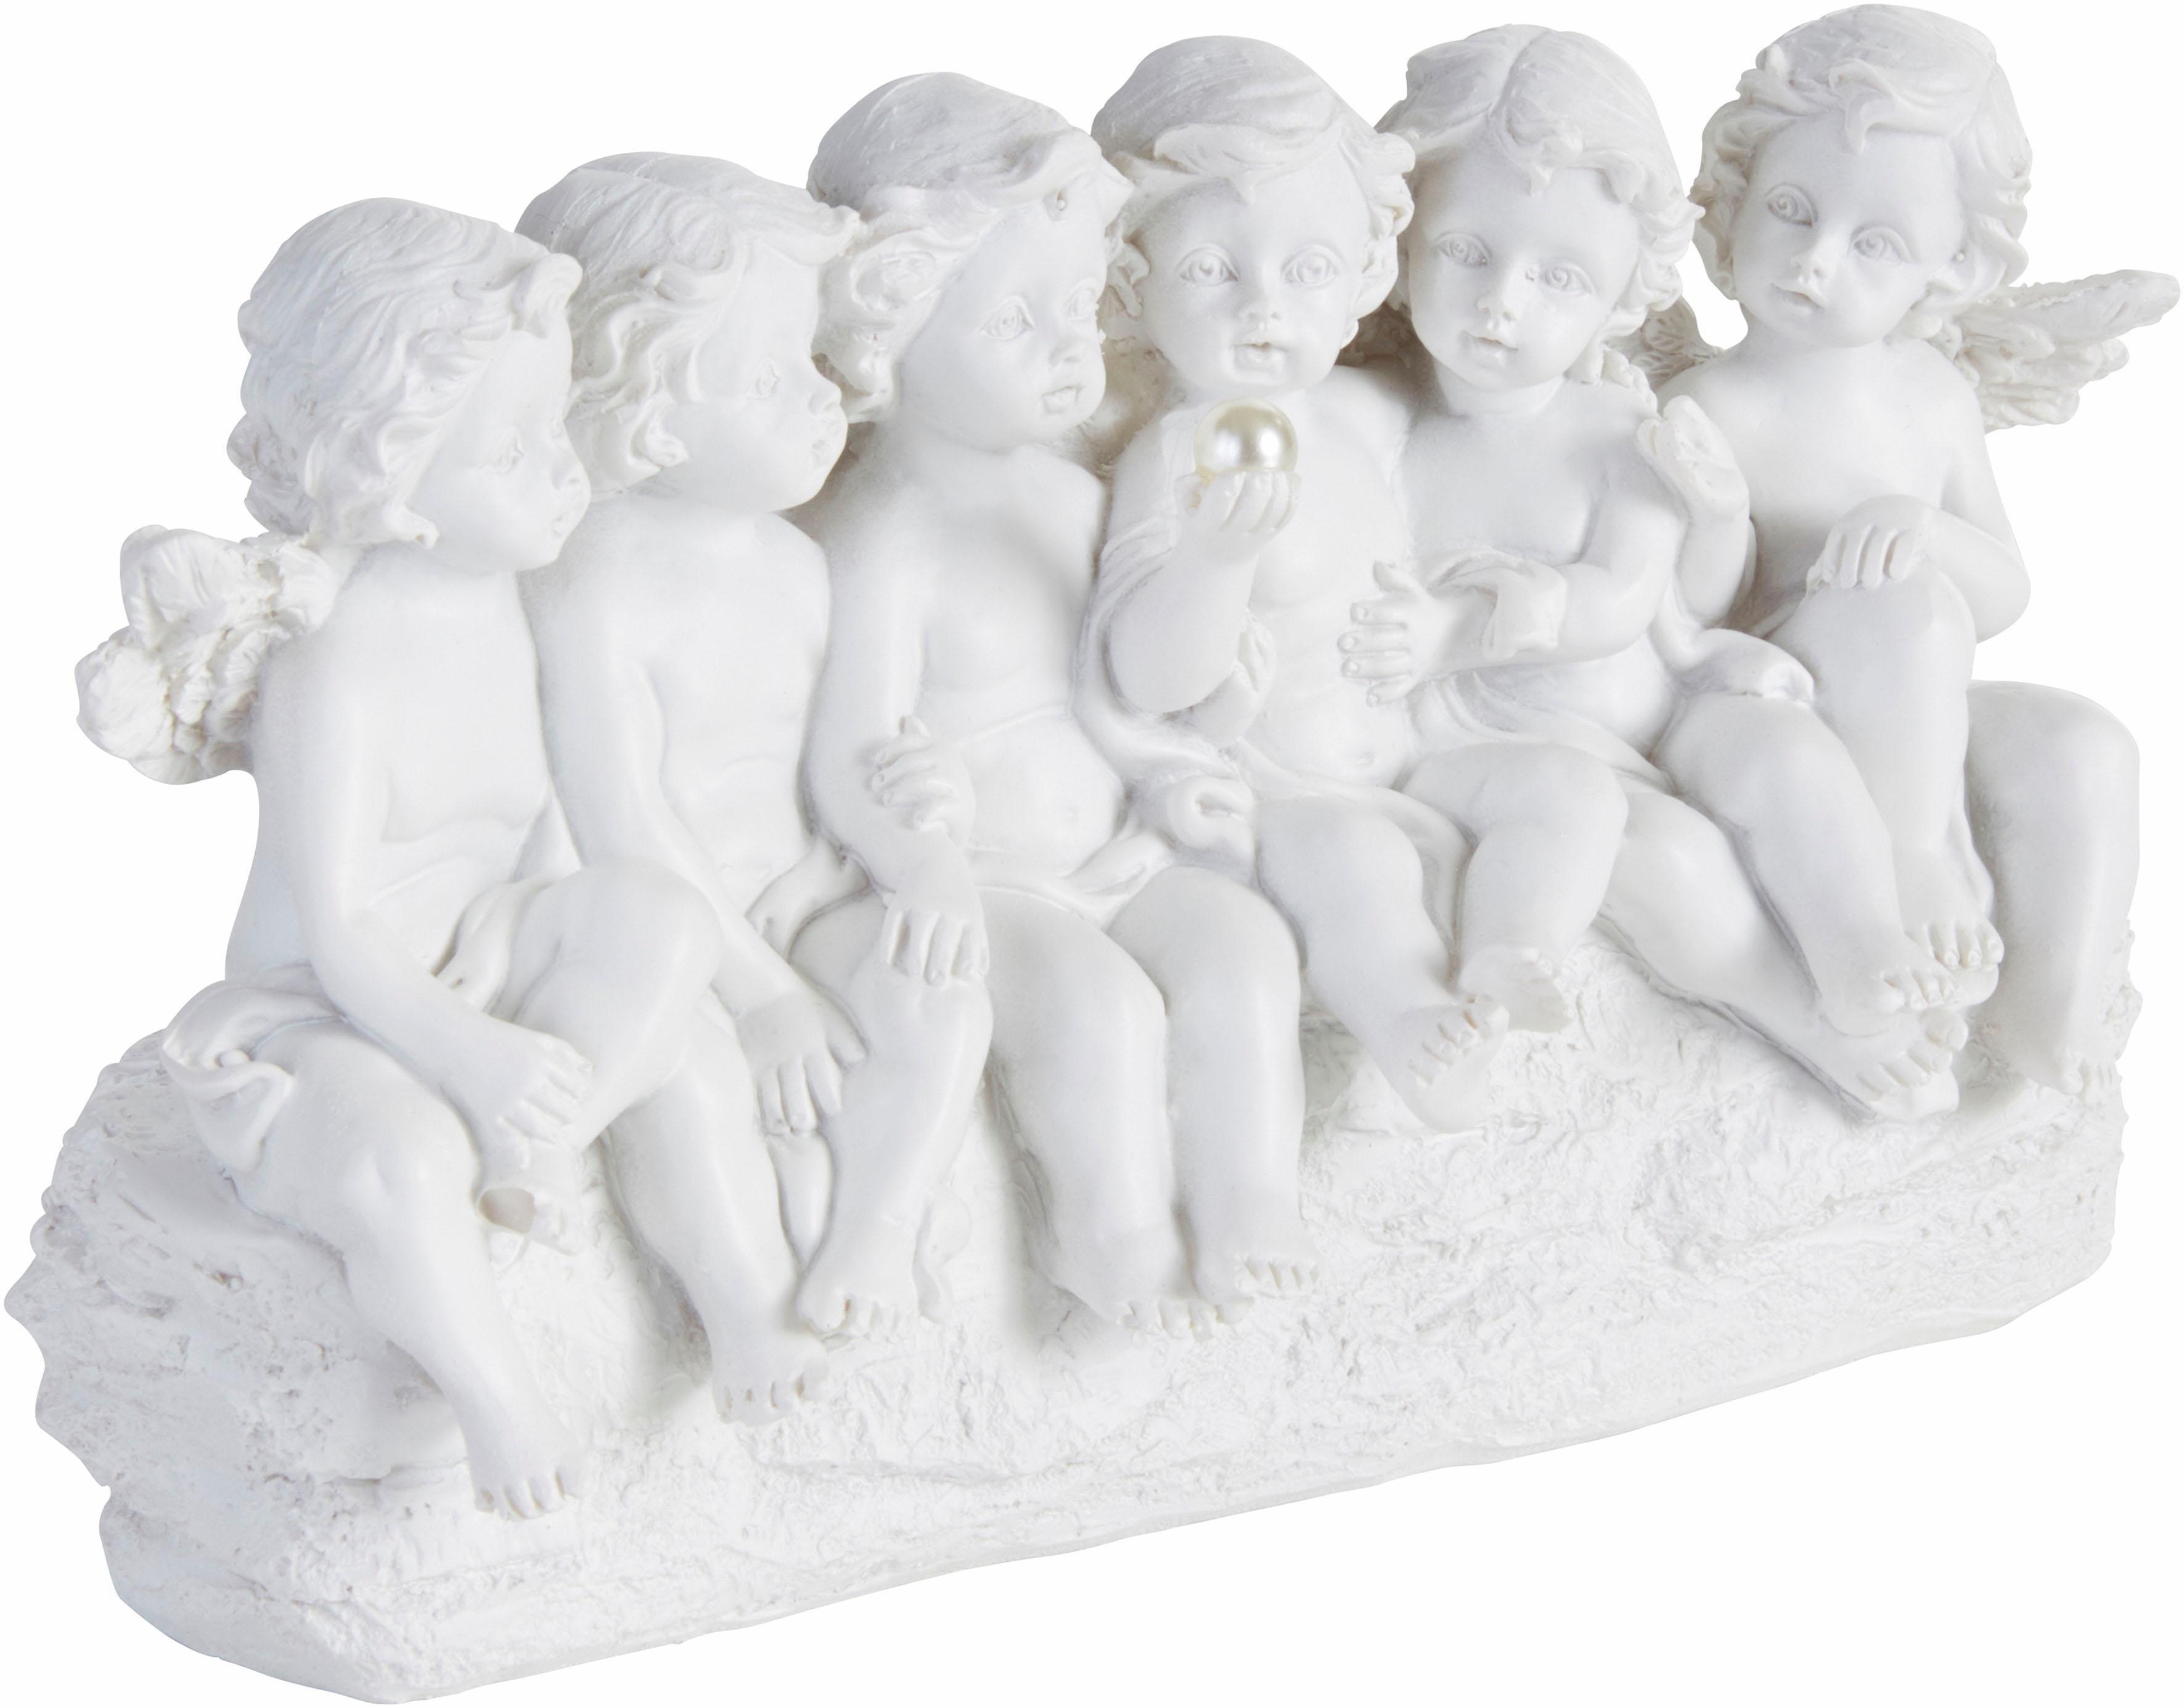 Dekofigur, Home affaire, »Engel« | Dekoration > Figuren und Skulpturen > Engel | Home affaire